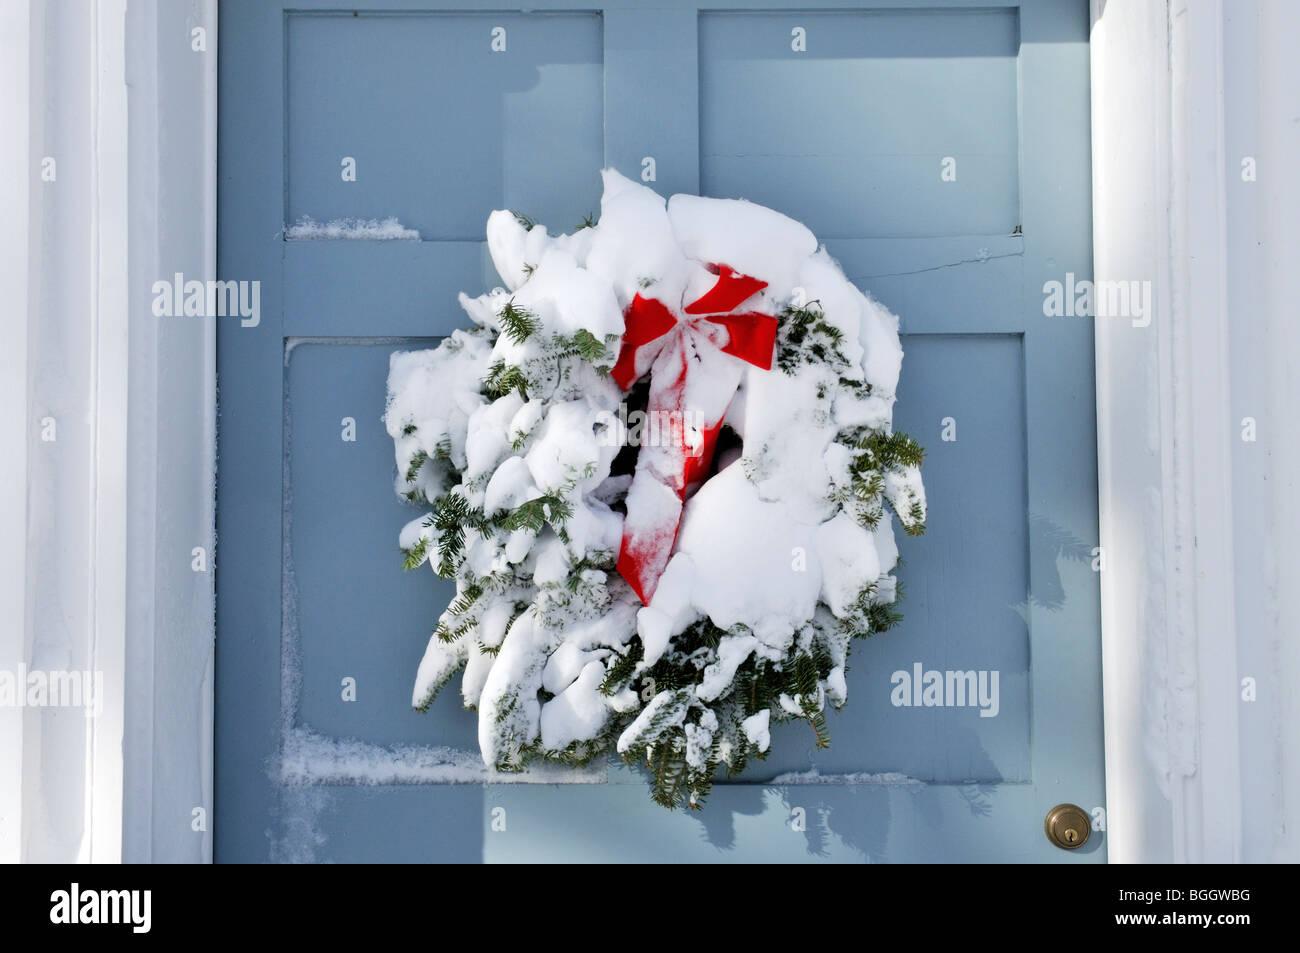 christmas wreath door snow stockfotos christmas wreath. Black Bedroom Furniture Sets. Home Design Ideas